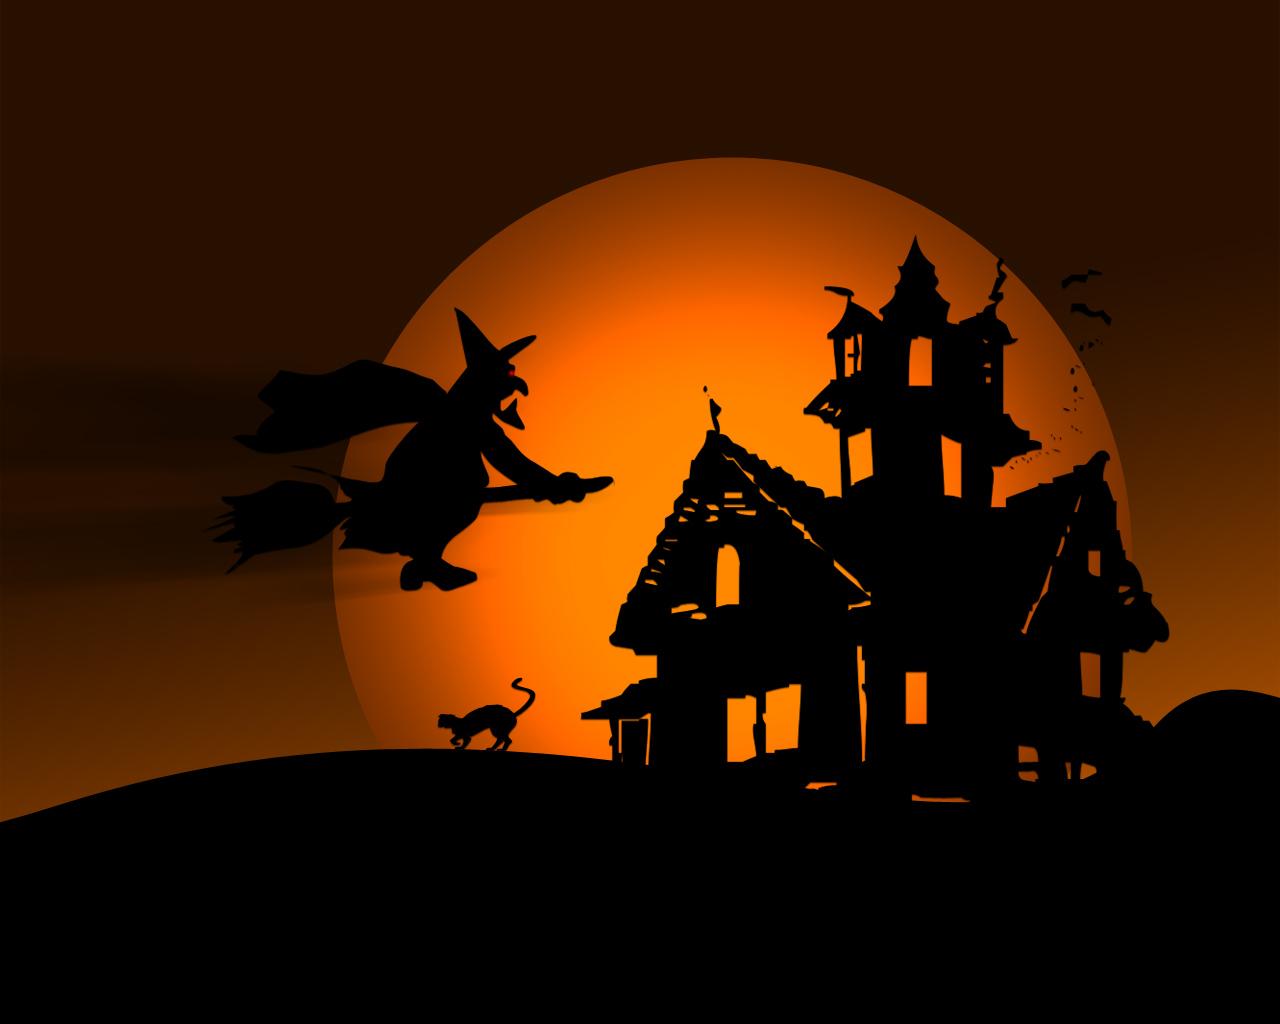 http://4.bp.blogspot.com/_zI1QeeTFAFc/TNF35cQlF8I/AAAAAAAACd8/vZ9V6oSObpU/s1600/halloween-195418.jpg